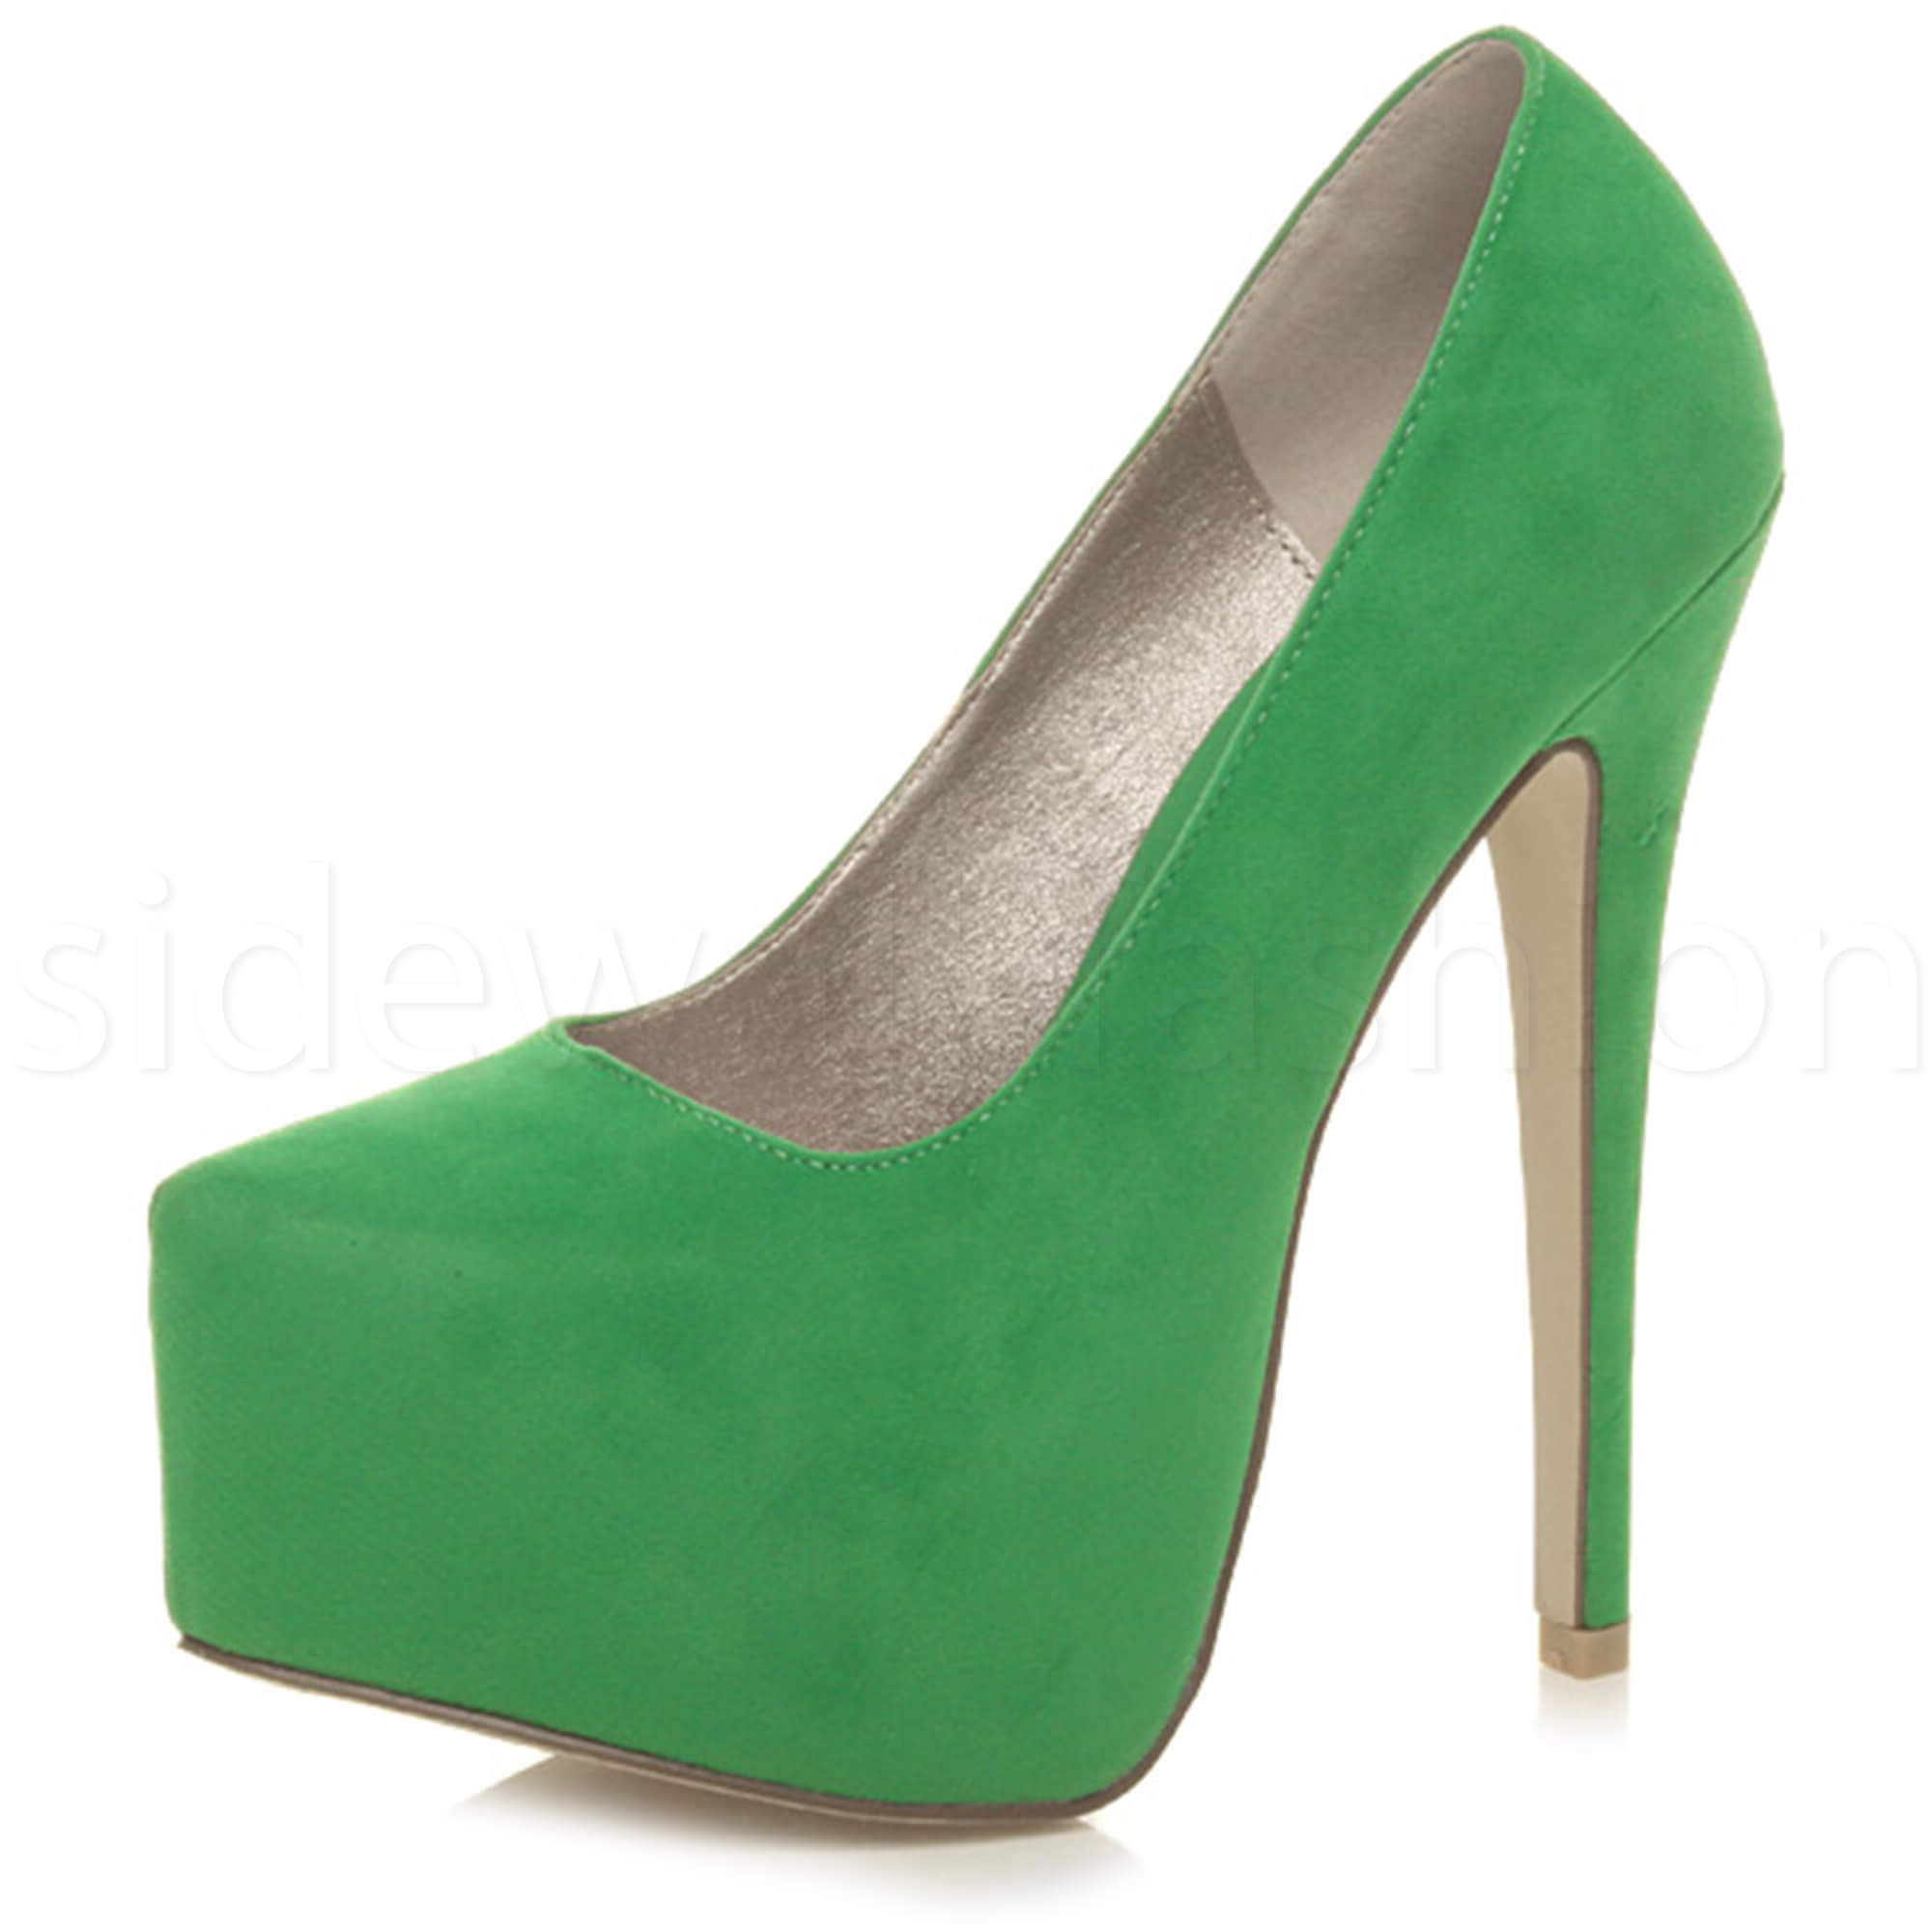 Mujer-Damas-Tacon-Alto-Oculta-Plataforma-Zapatos-Clasicos-Tribunal-Puntiagudo-bomba-Tamano